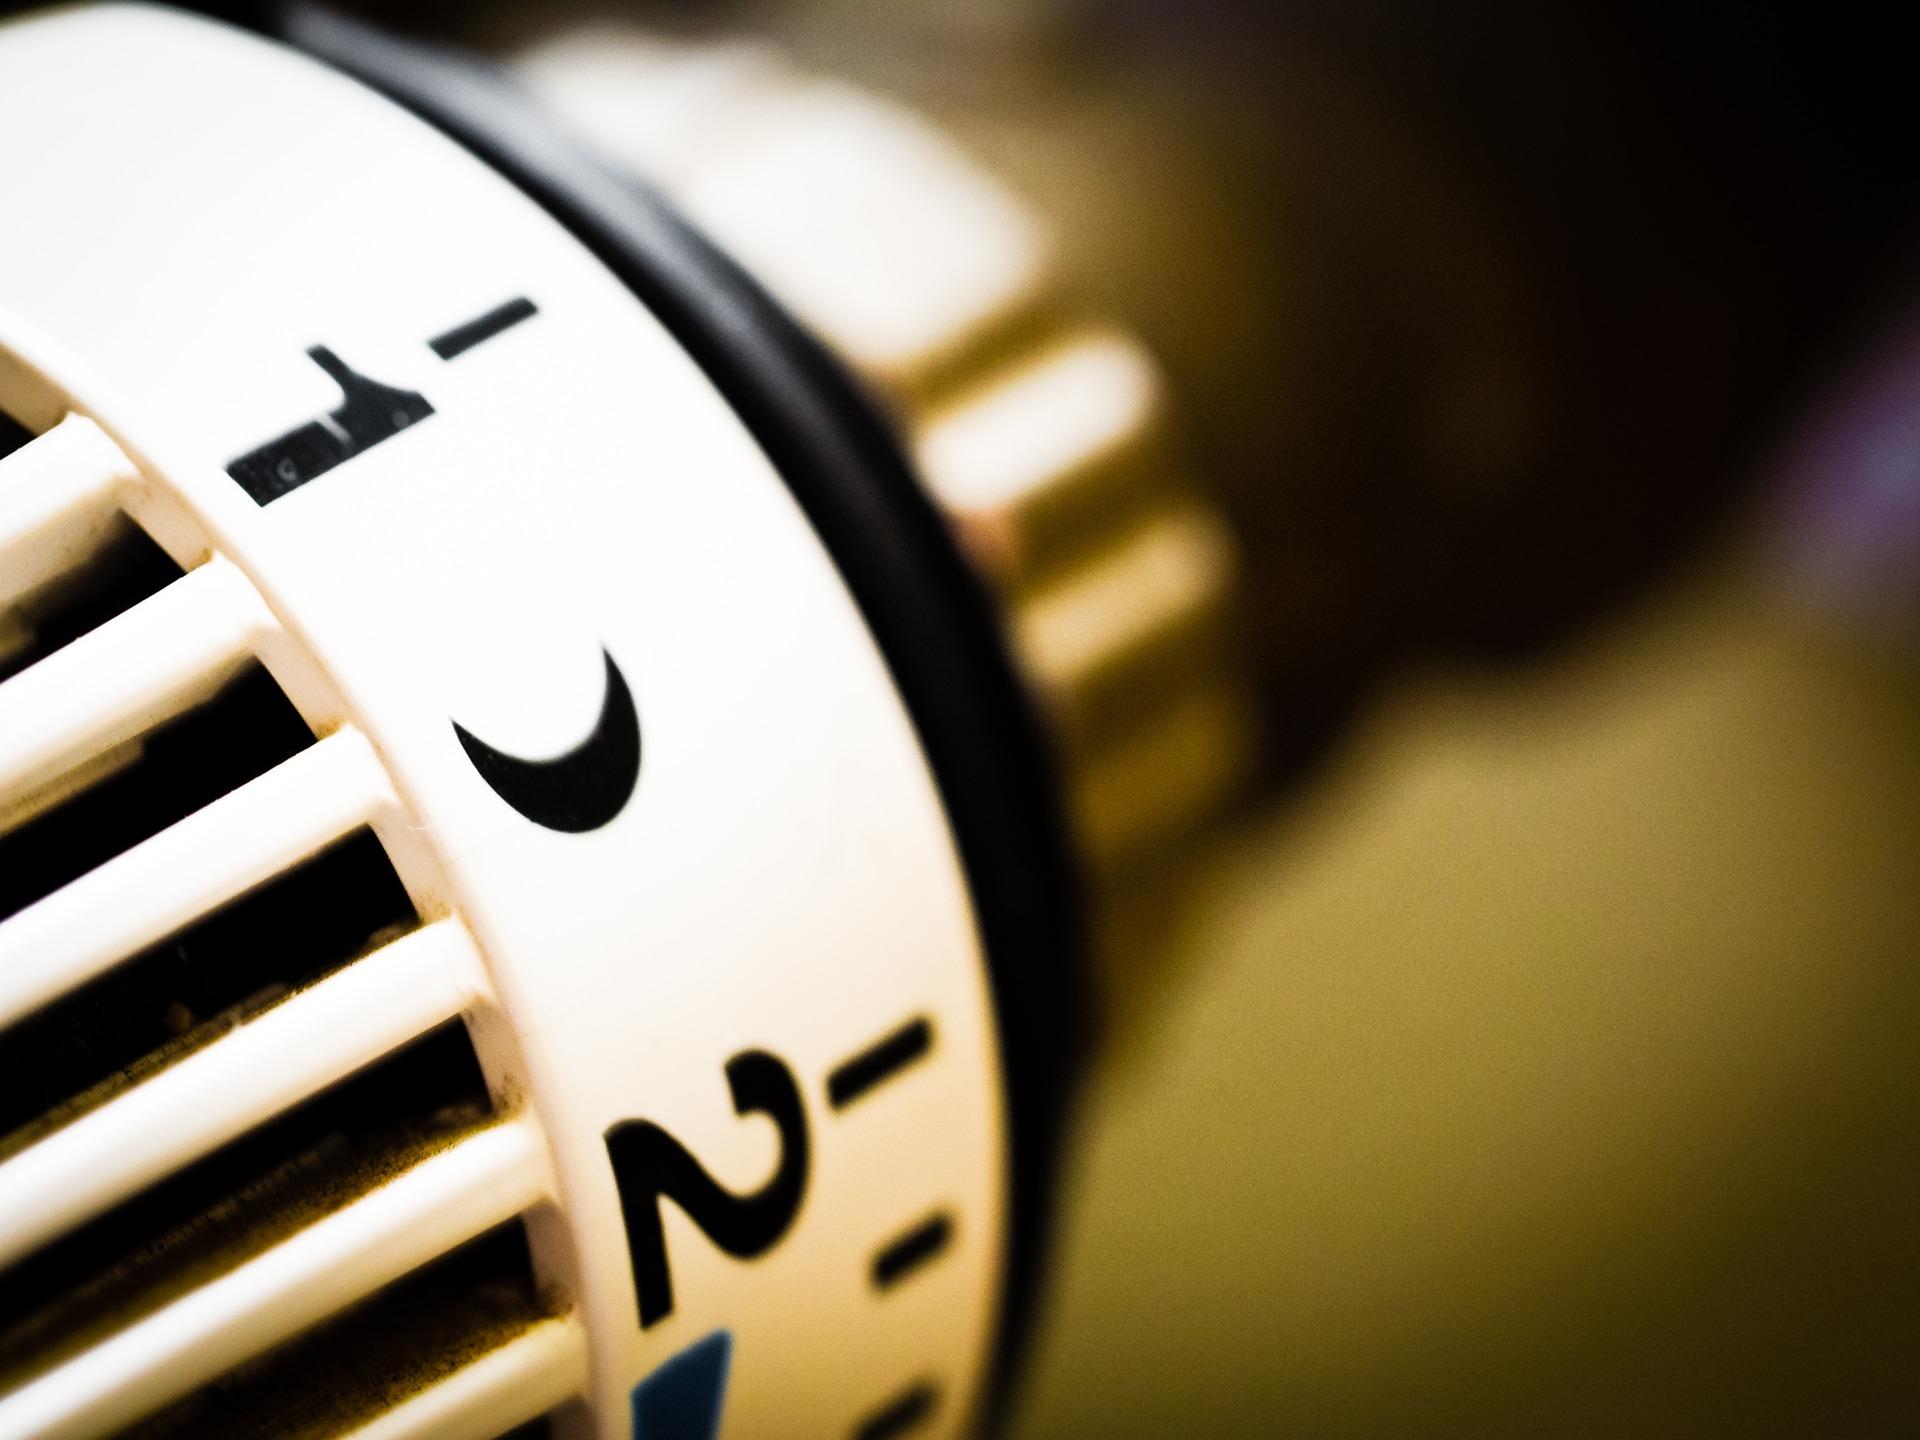 energie úspora